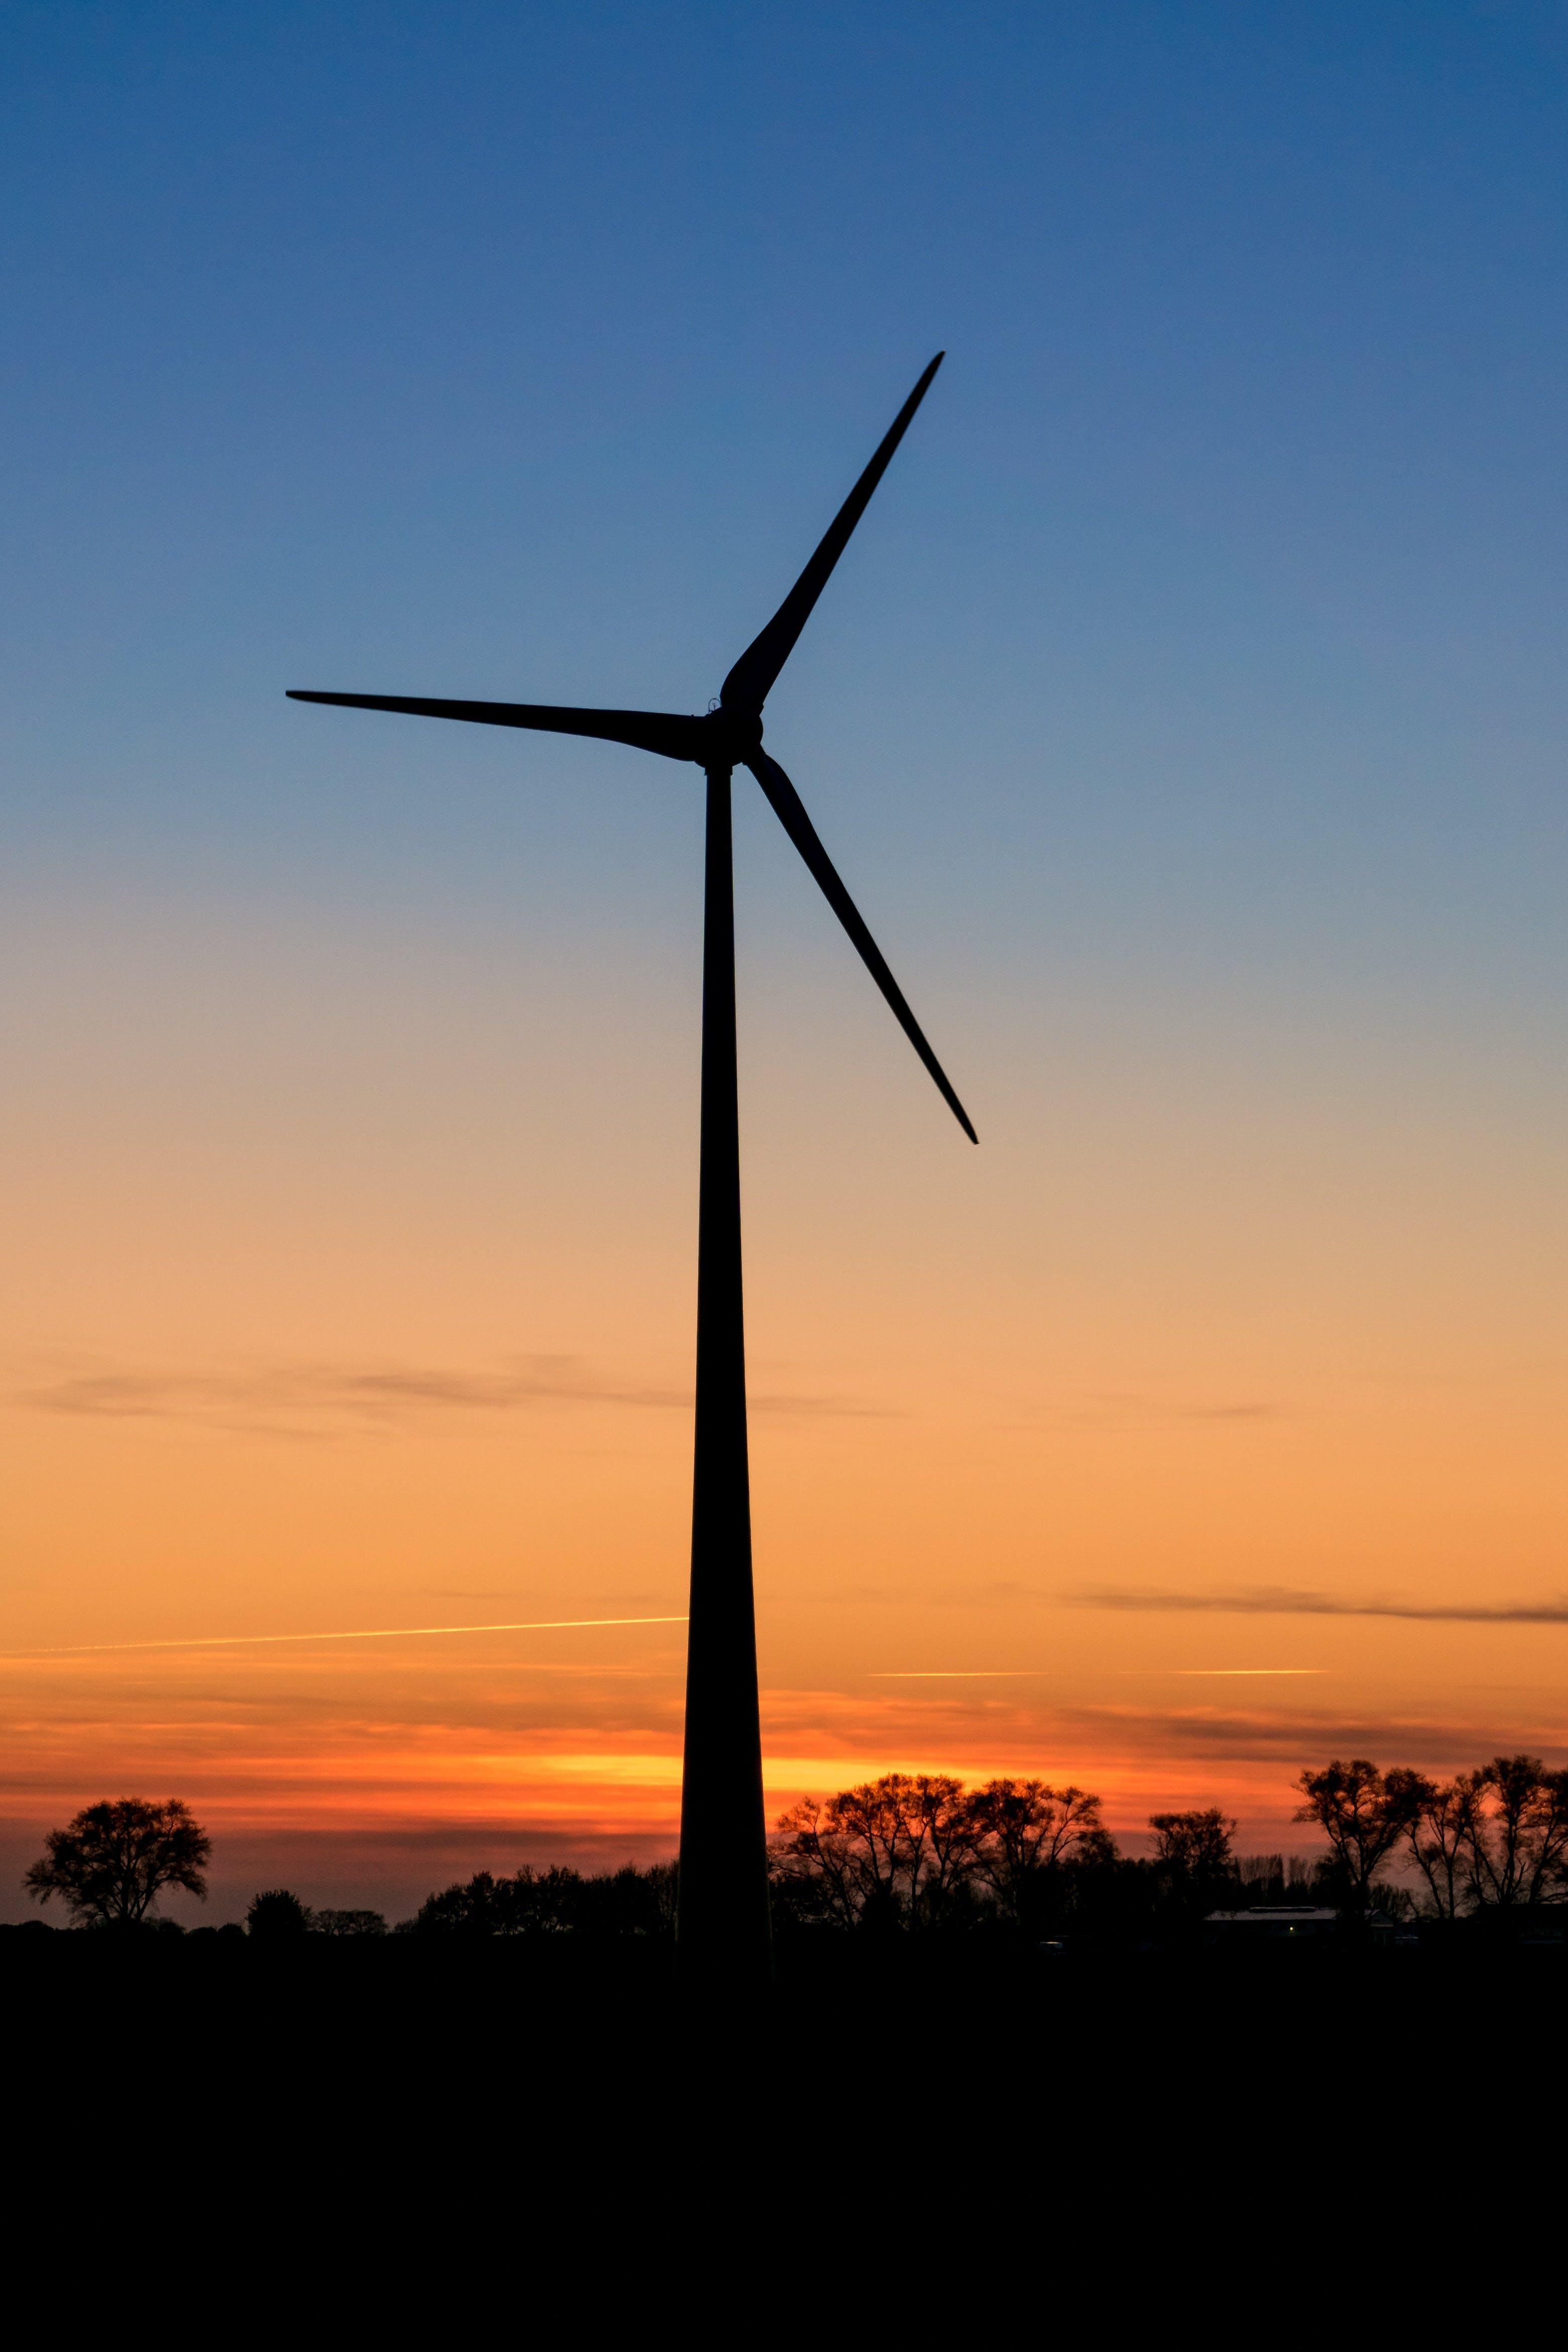 abendrot, alternative energie, dämmerung